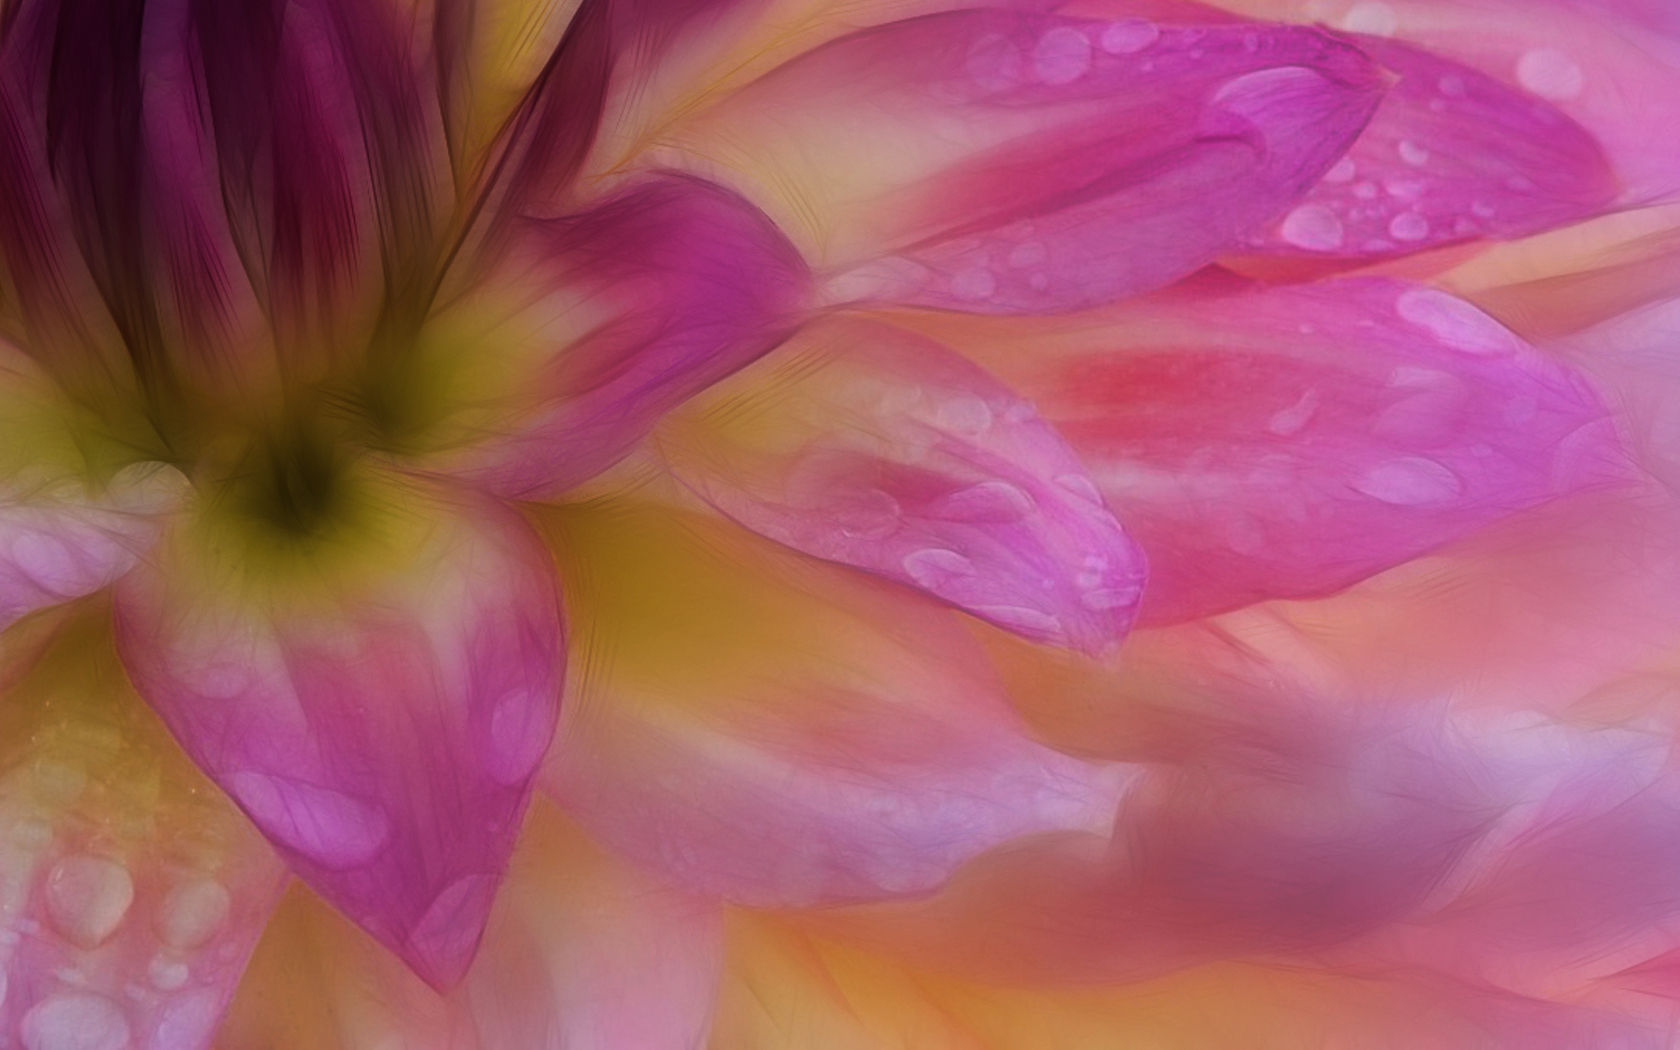 Erde/Natur - Blume  Pastel Wallpaper